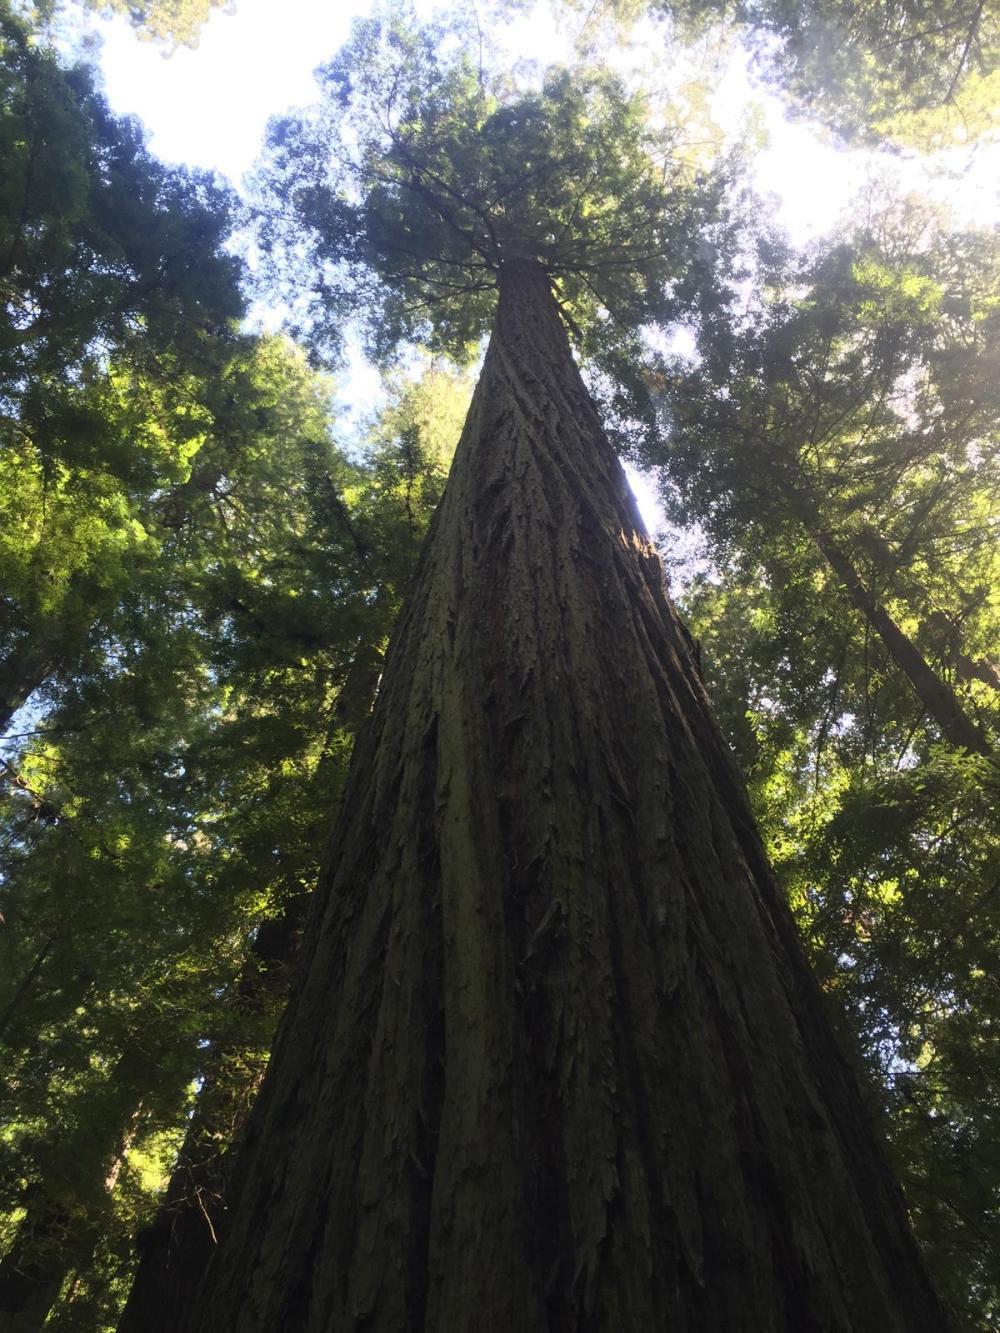 Bucket List View - Giant Redwood Trees